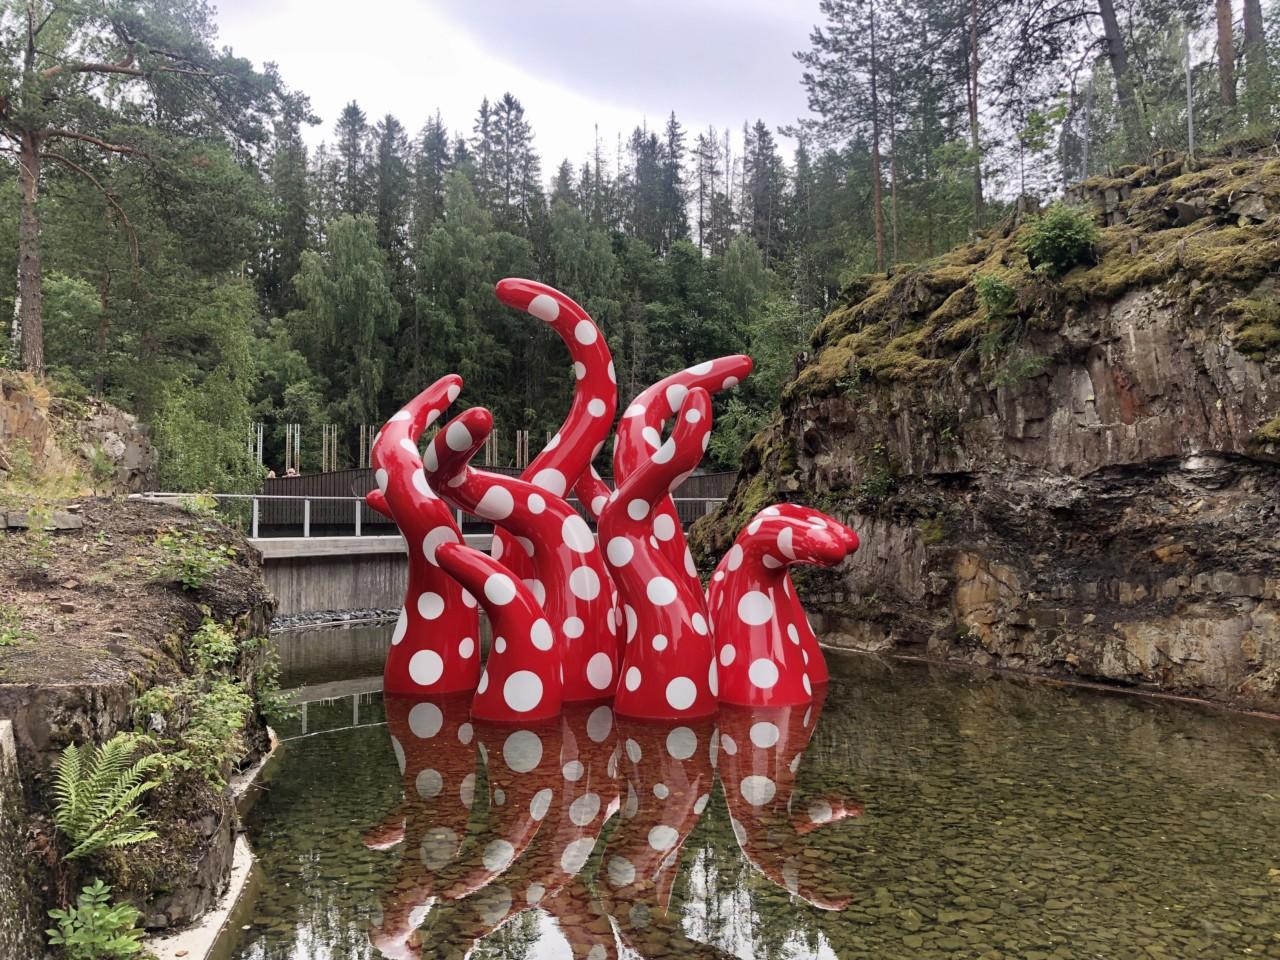 yayoi-kusama-blekksprut-kistefos-museet-fantastisk-barnevennlig-kunst